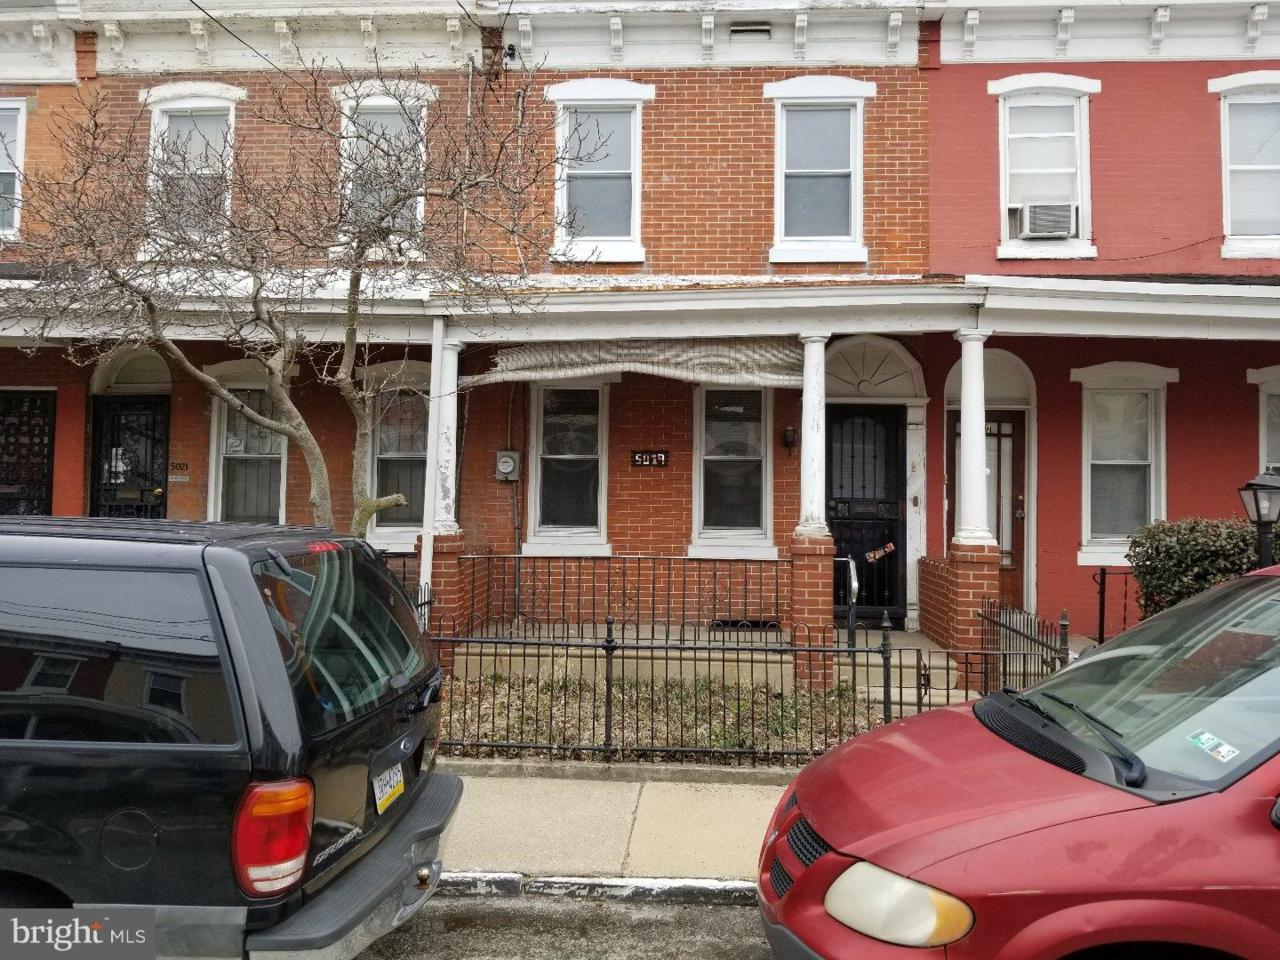 5019 Portico Street - Photo 1